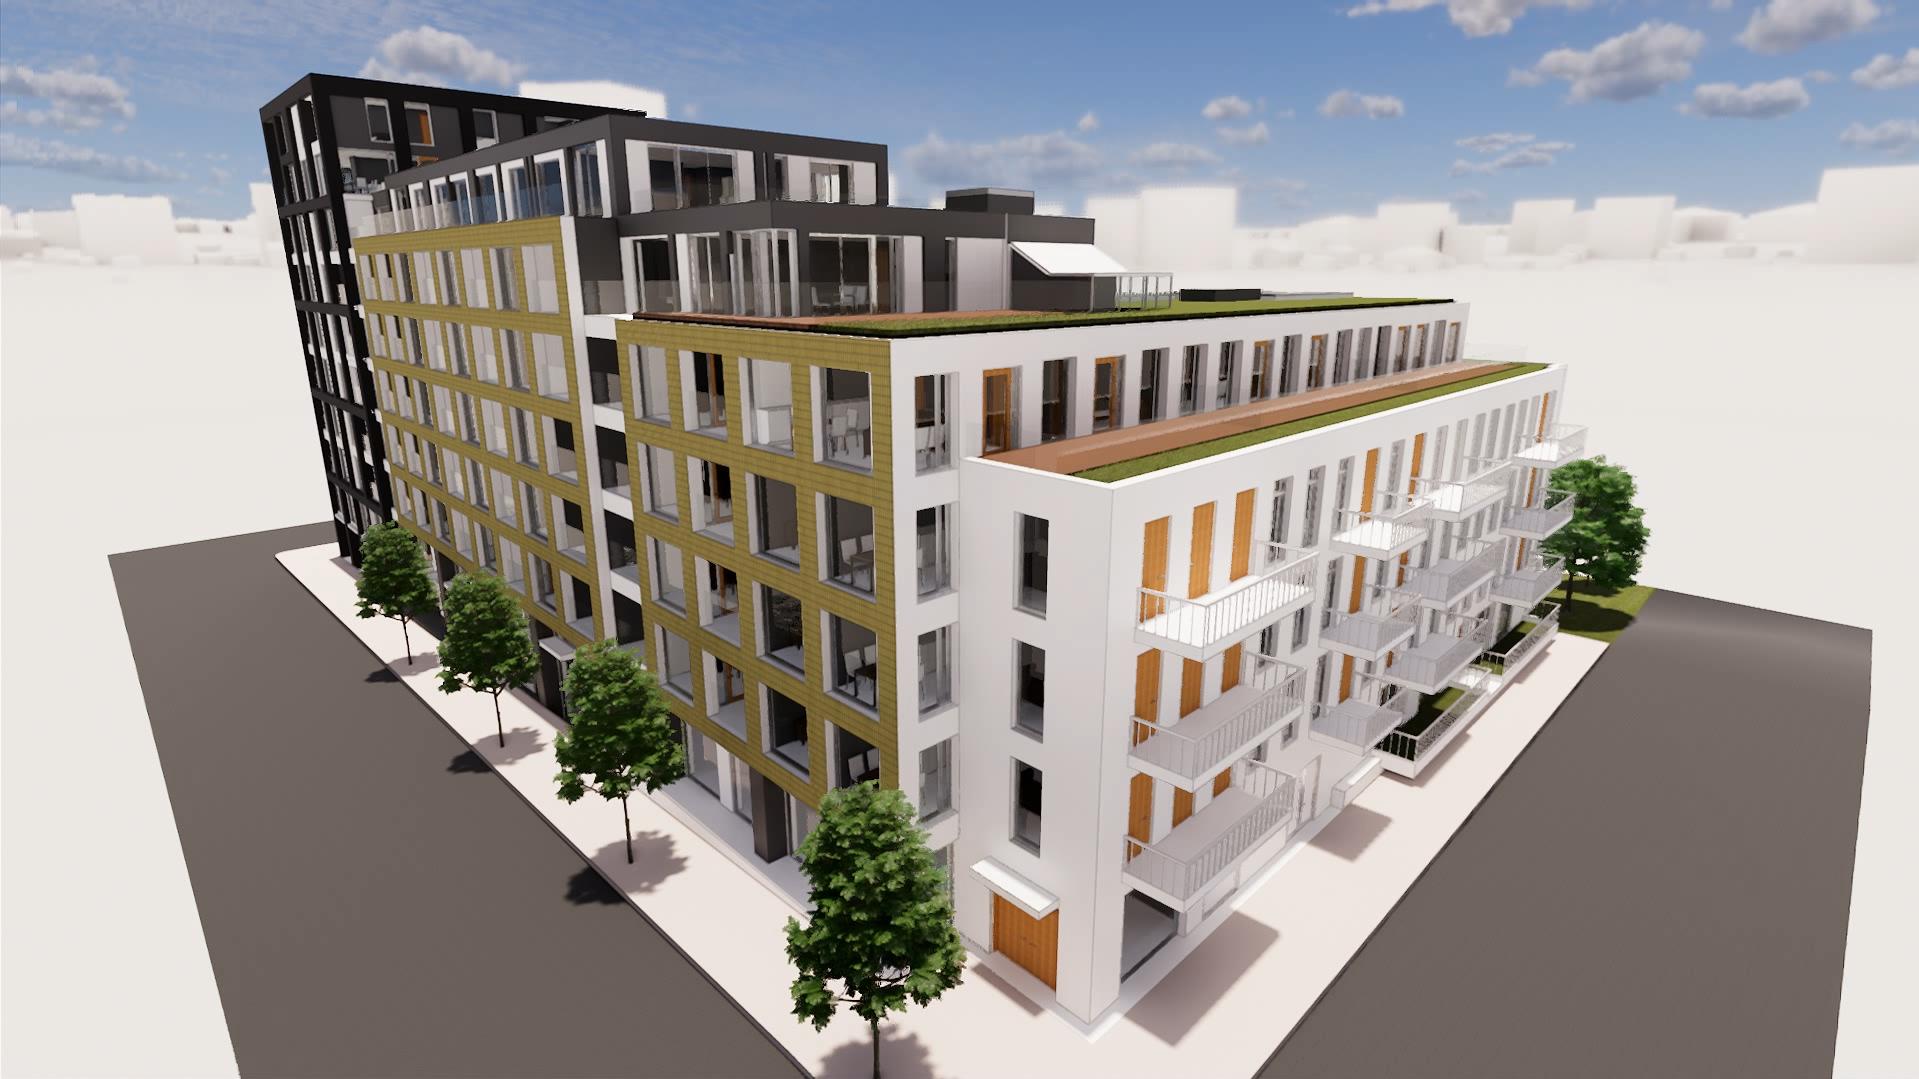 Street view model of Kings Cross Quarter, London